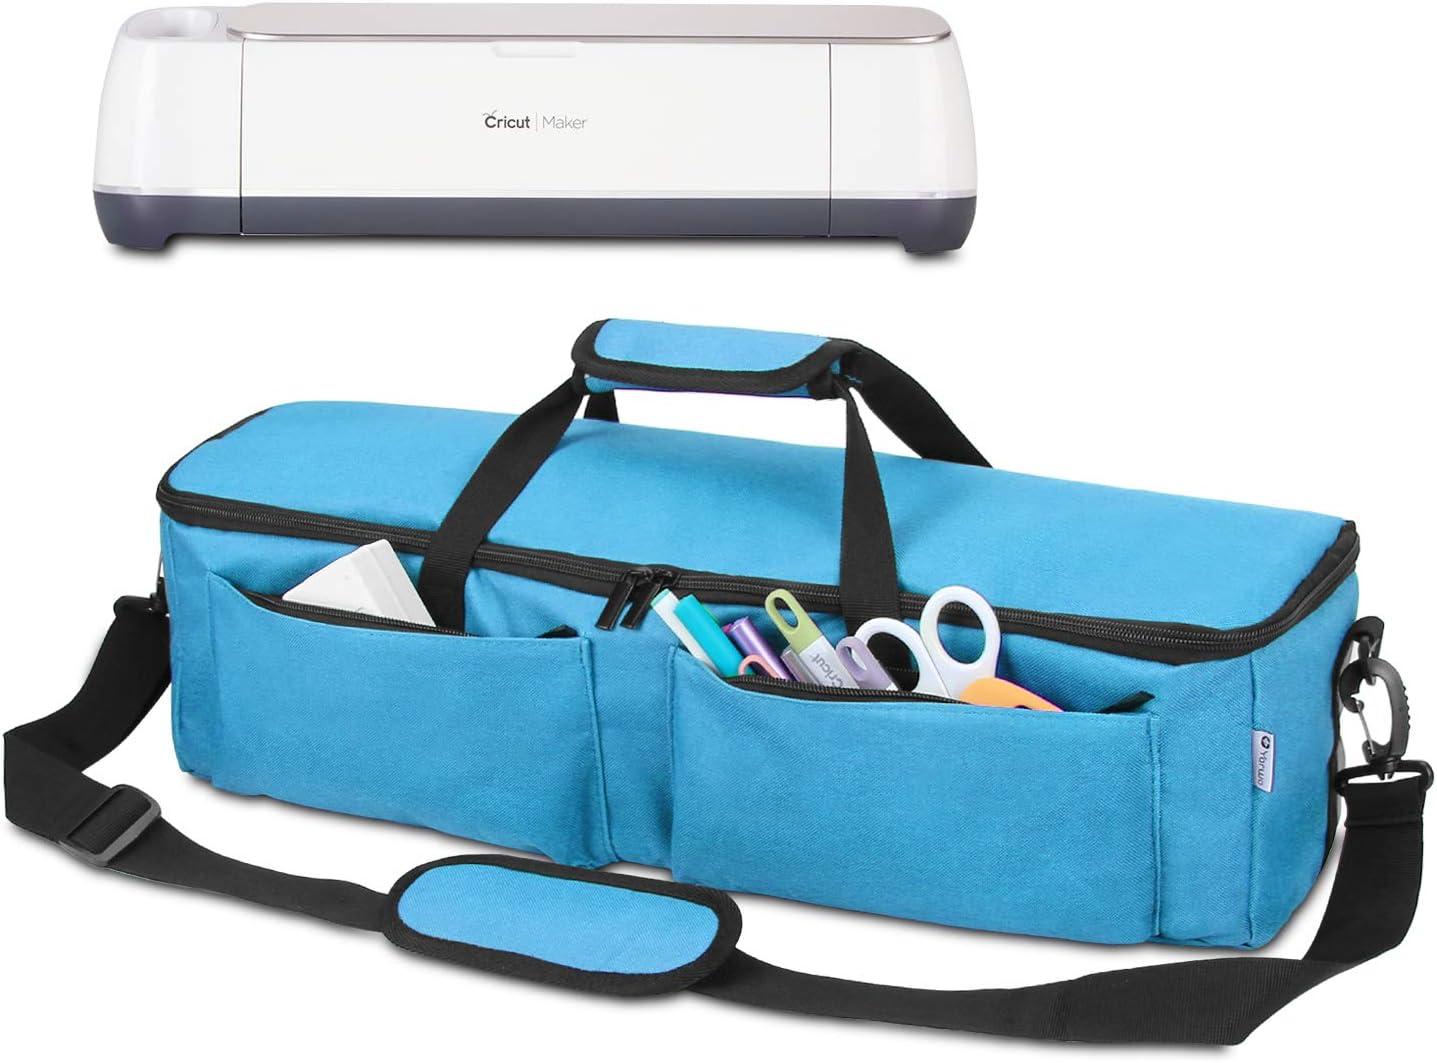 Carrying Bags for Cricut Explore Cricut Accessories Storage Bag